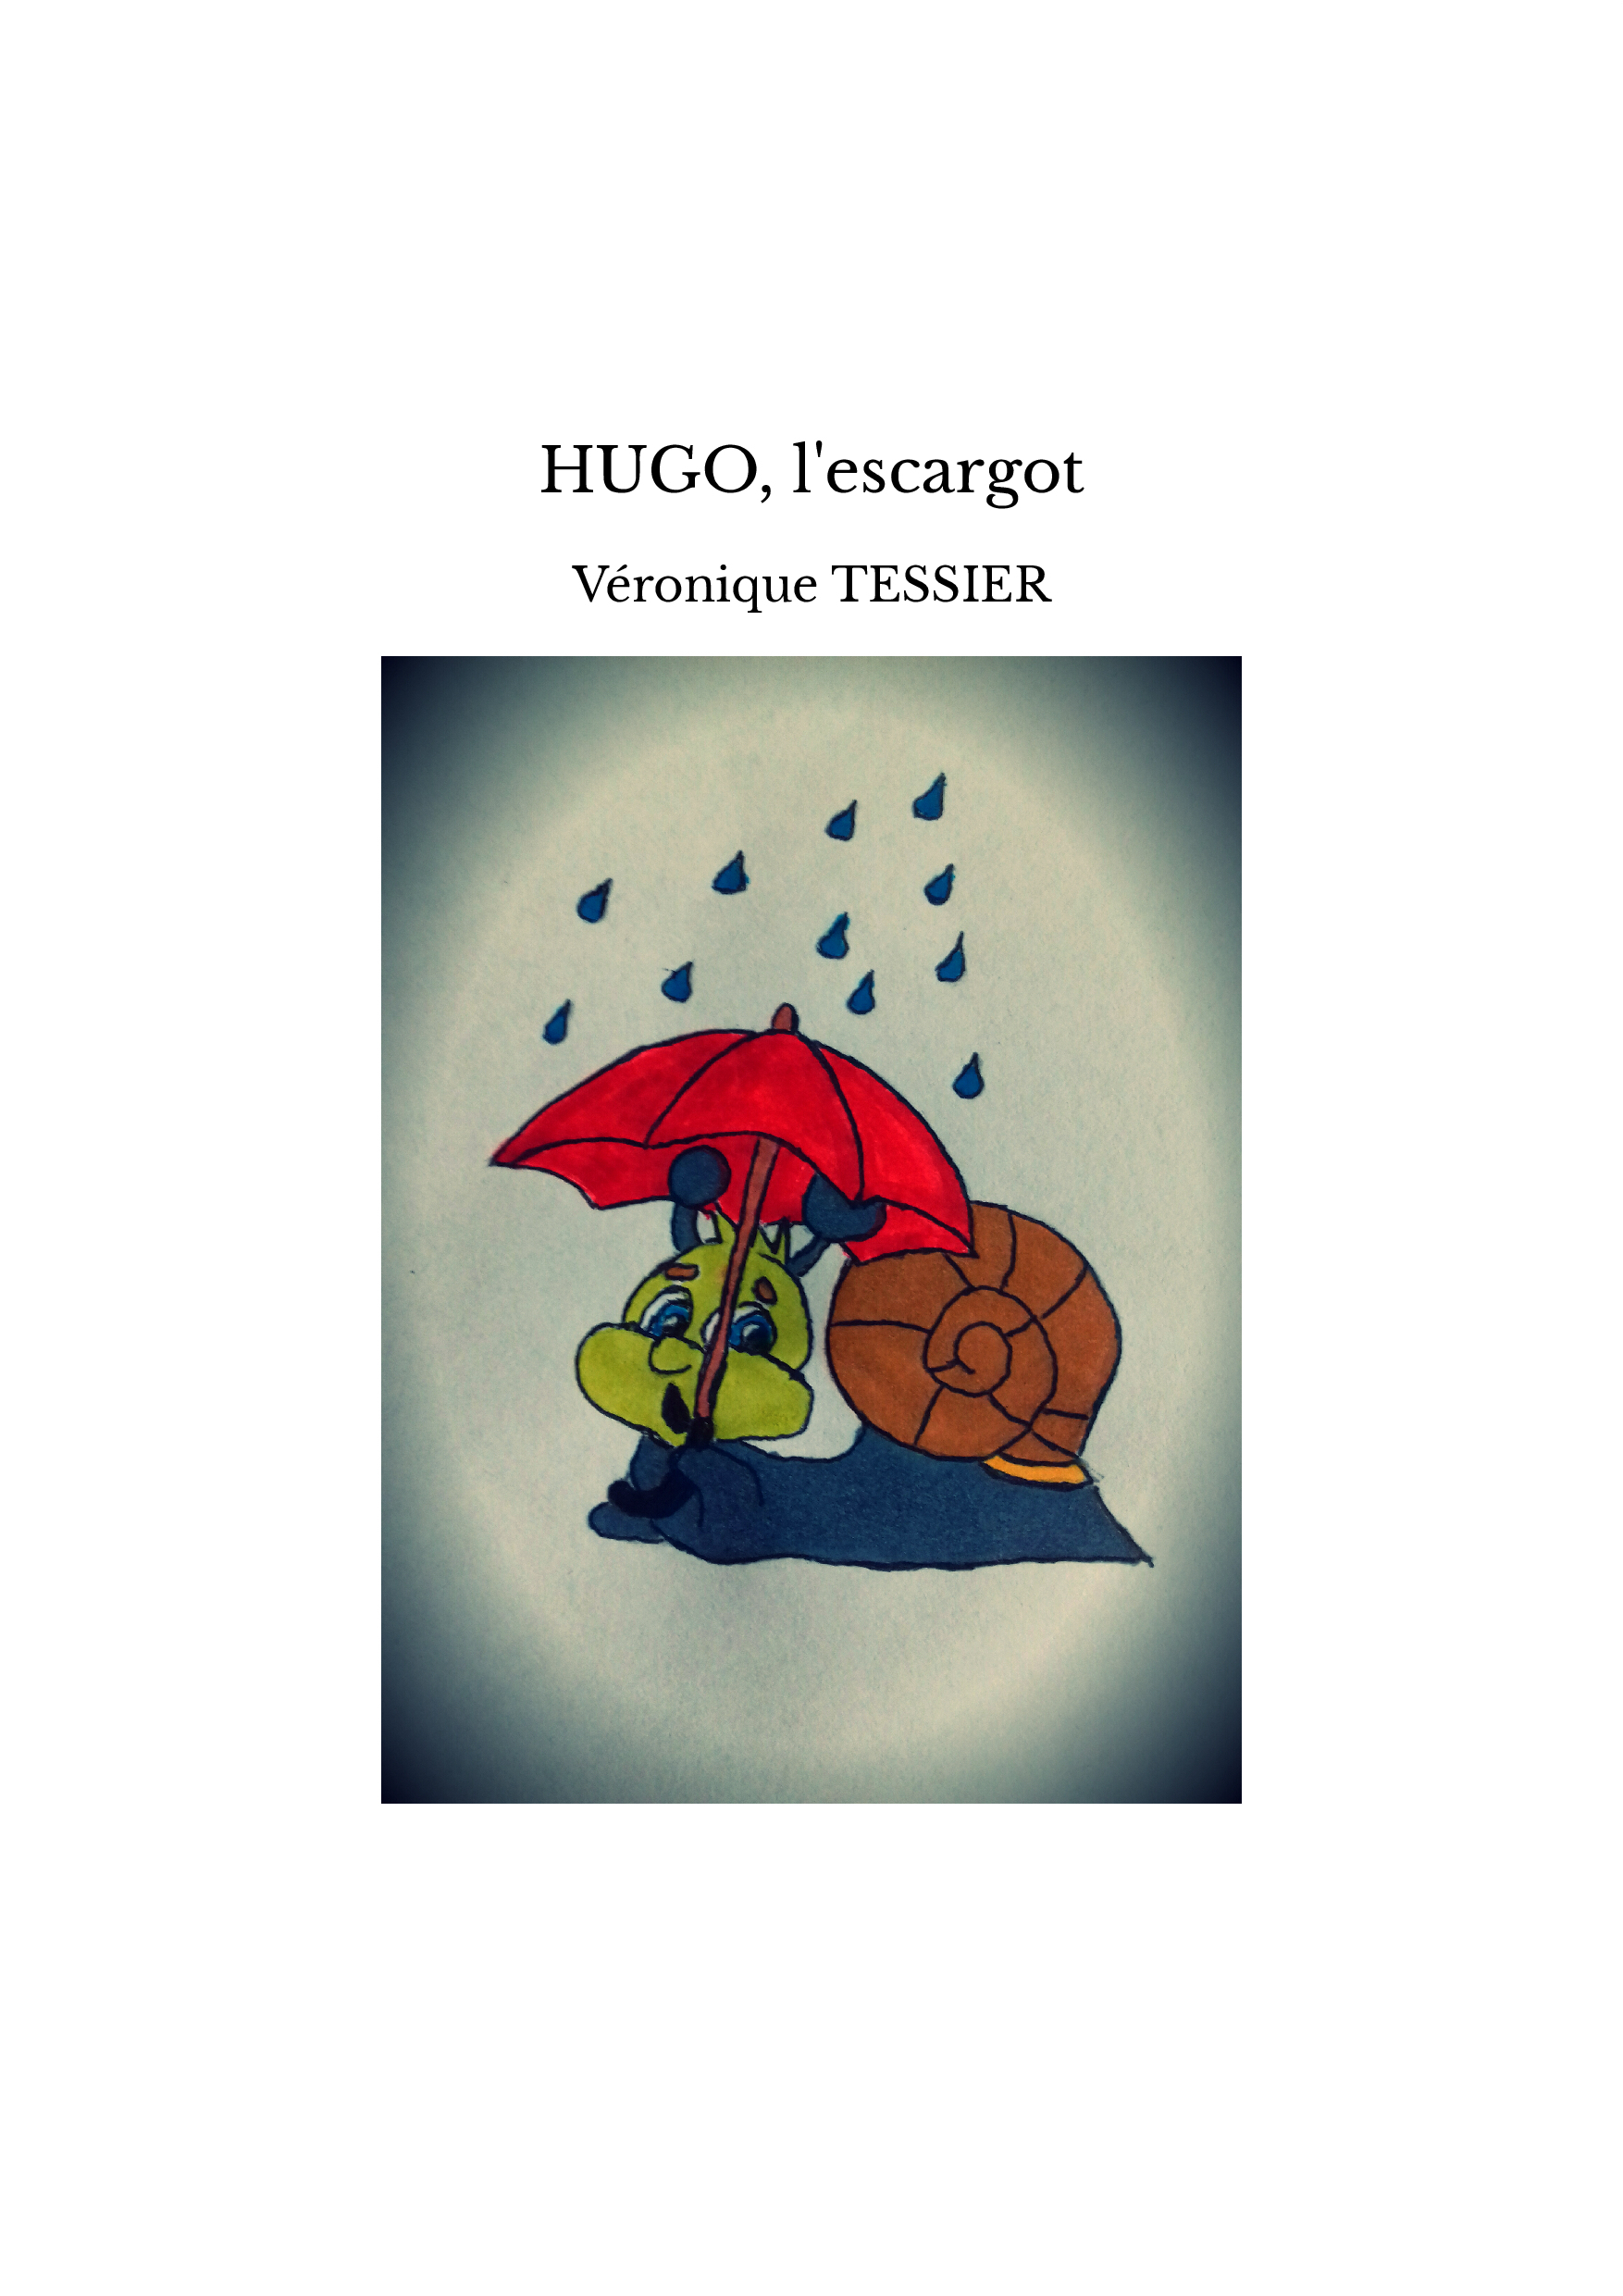 Hugo, L'Escargot - Veronimo à Hugo L Ecargot